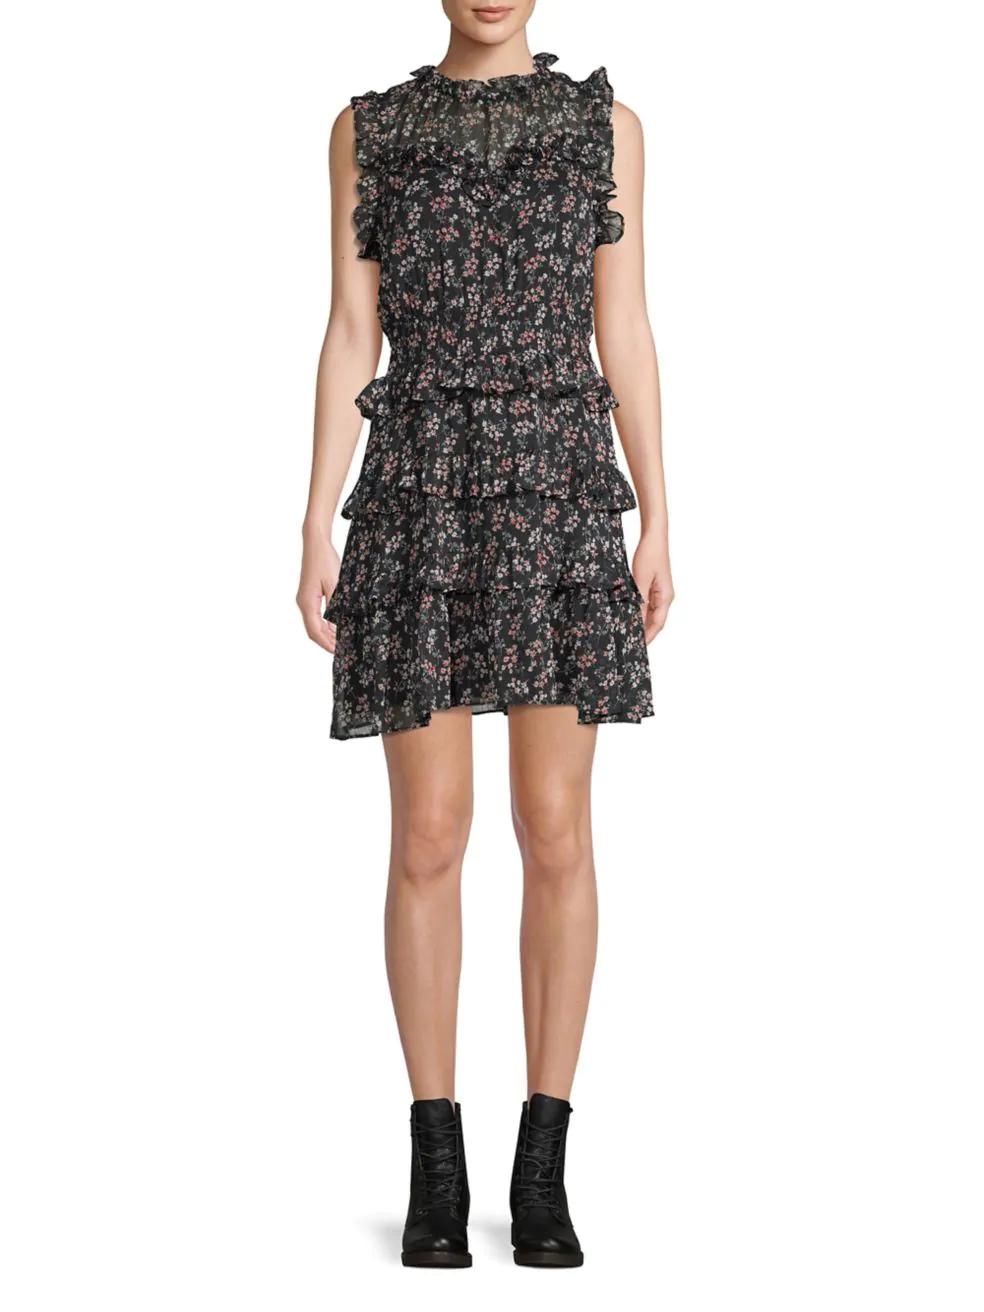 DESIGN LAB LORD & TAYLOR. Floral A-Line Dress.